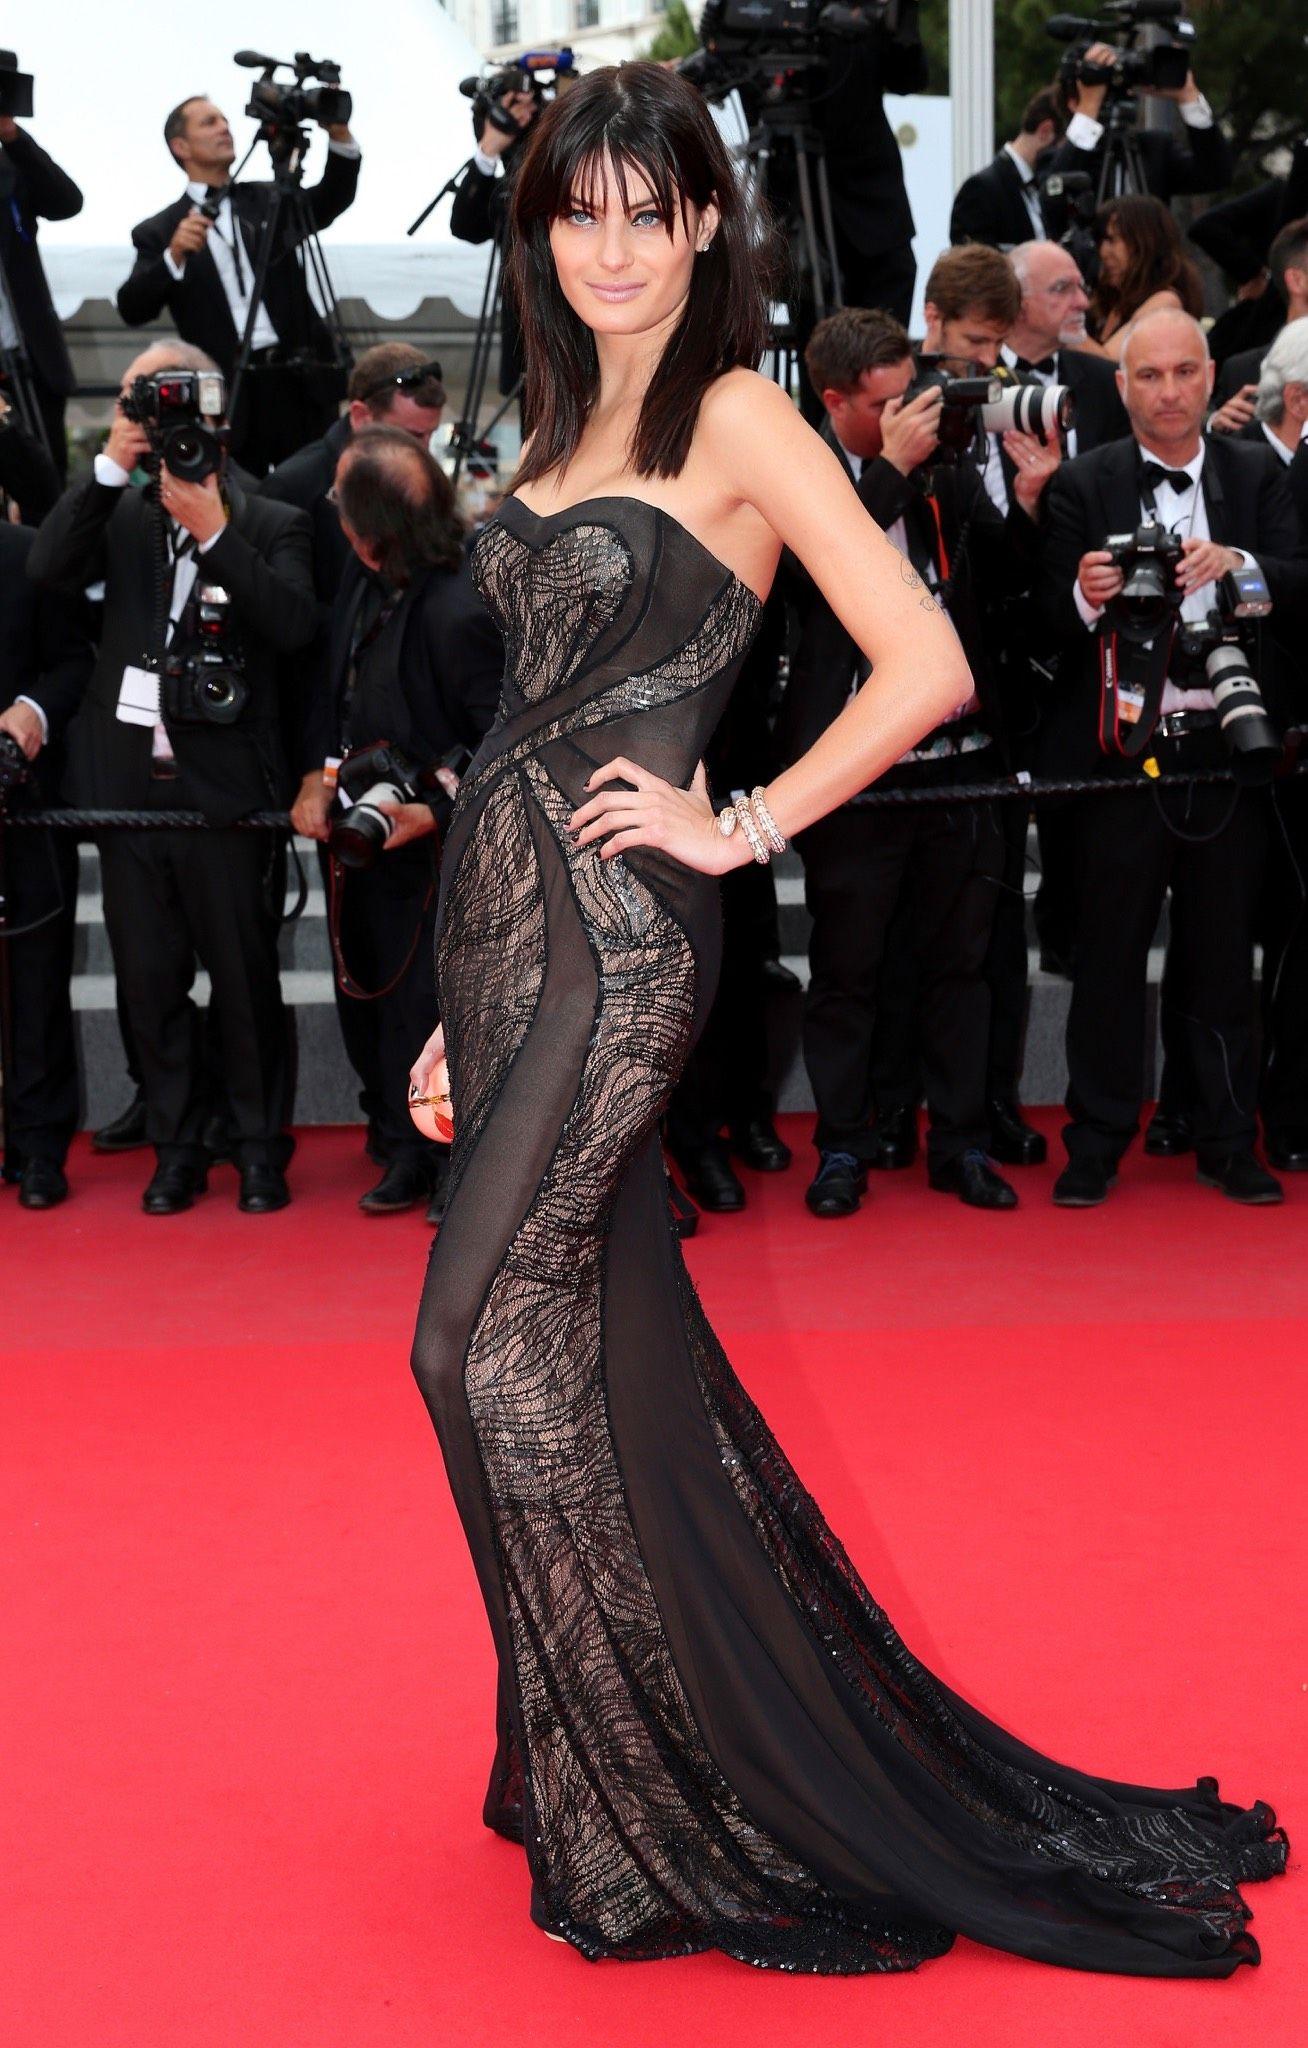 Celebrities Gear Up For Grammy Awds 2014   Chrissy teigen